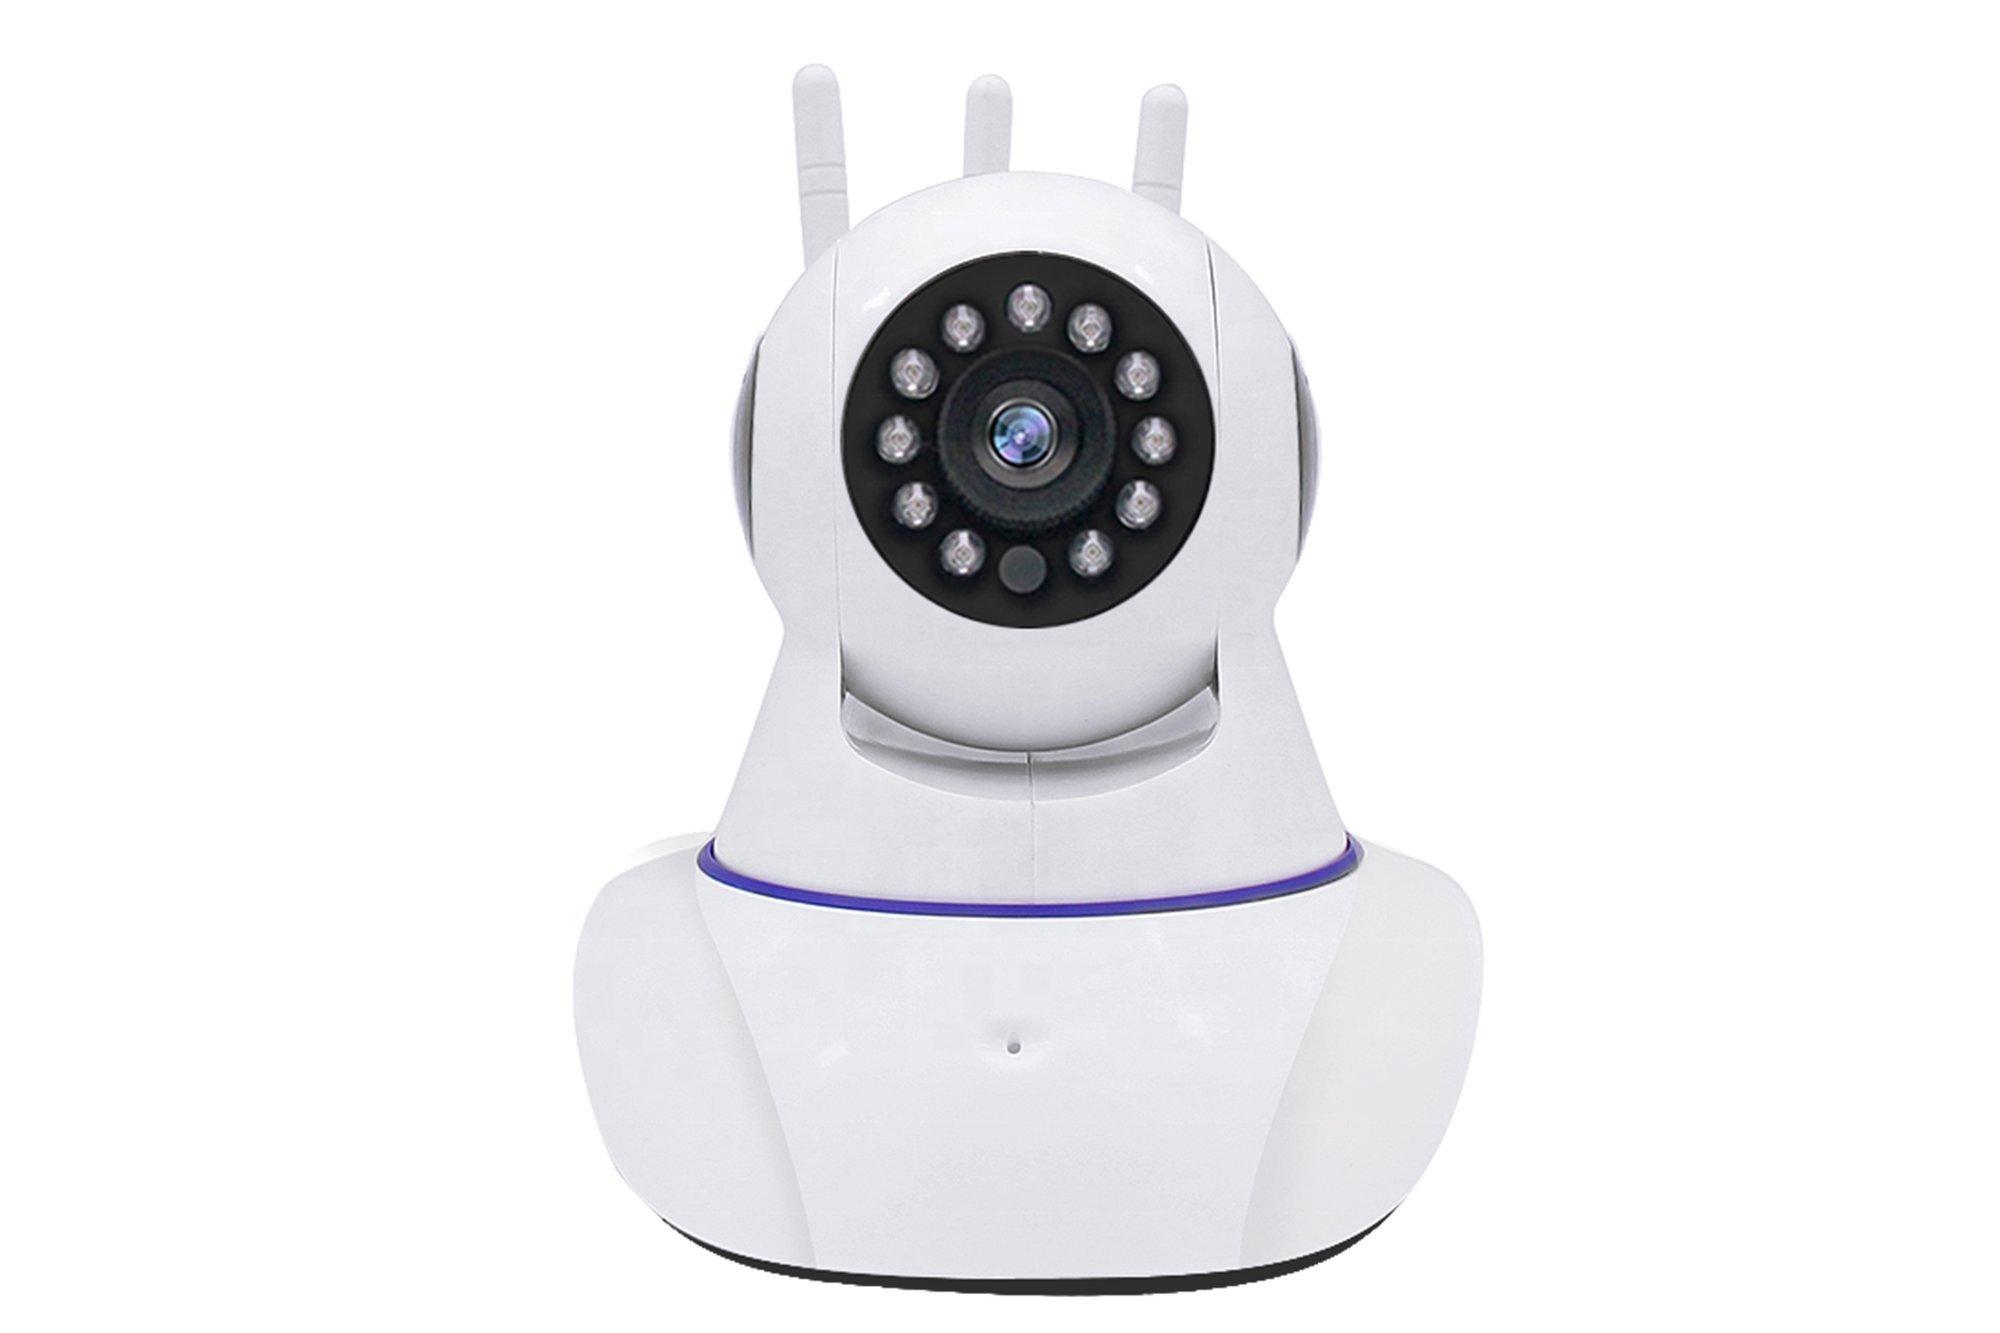 IP-Kamera V380 Pro WiFi HD 720P 11IR LED